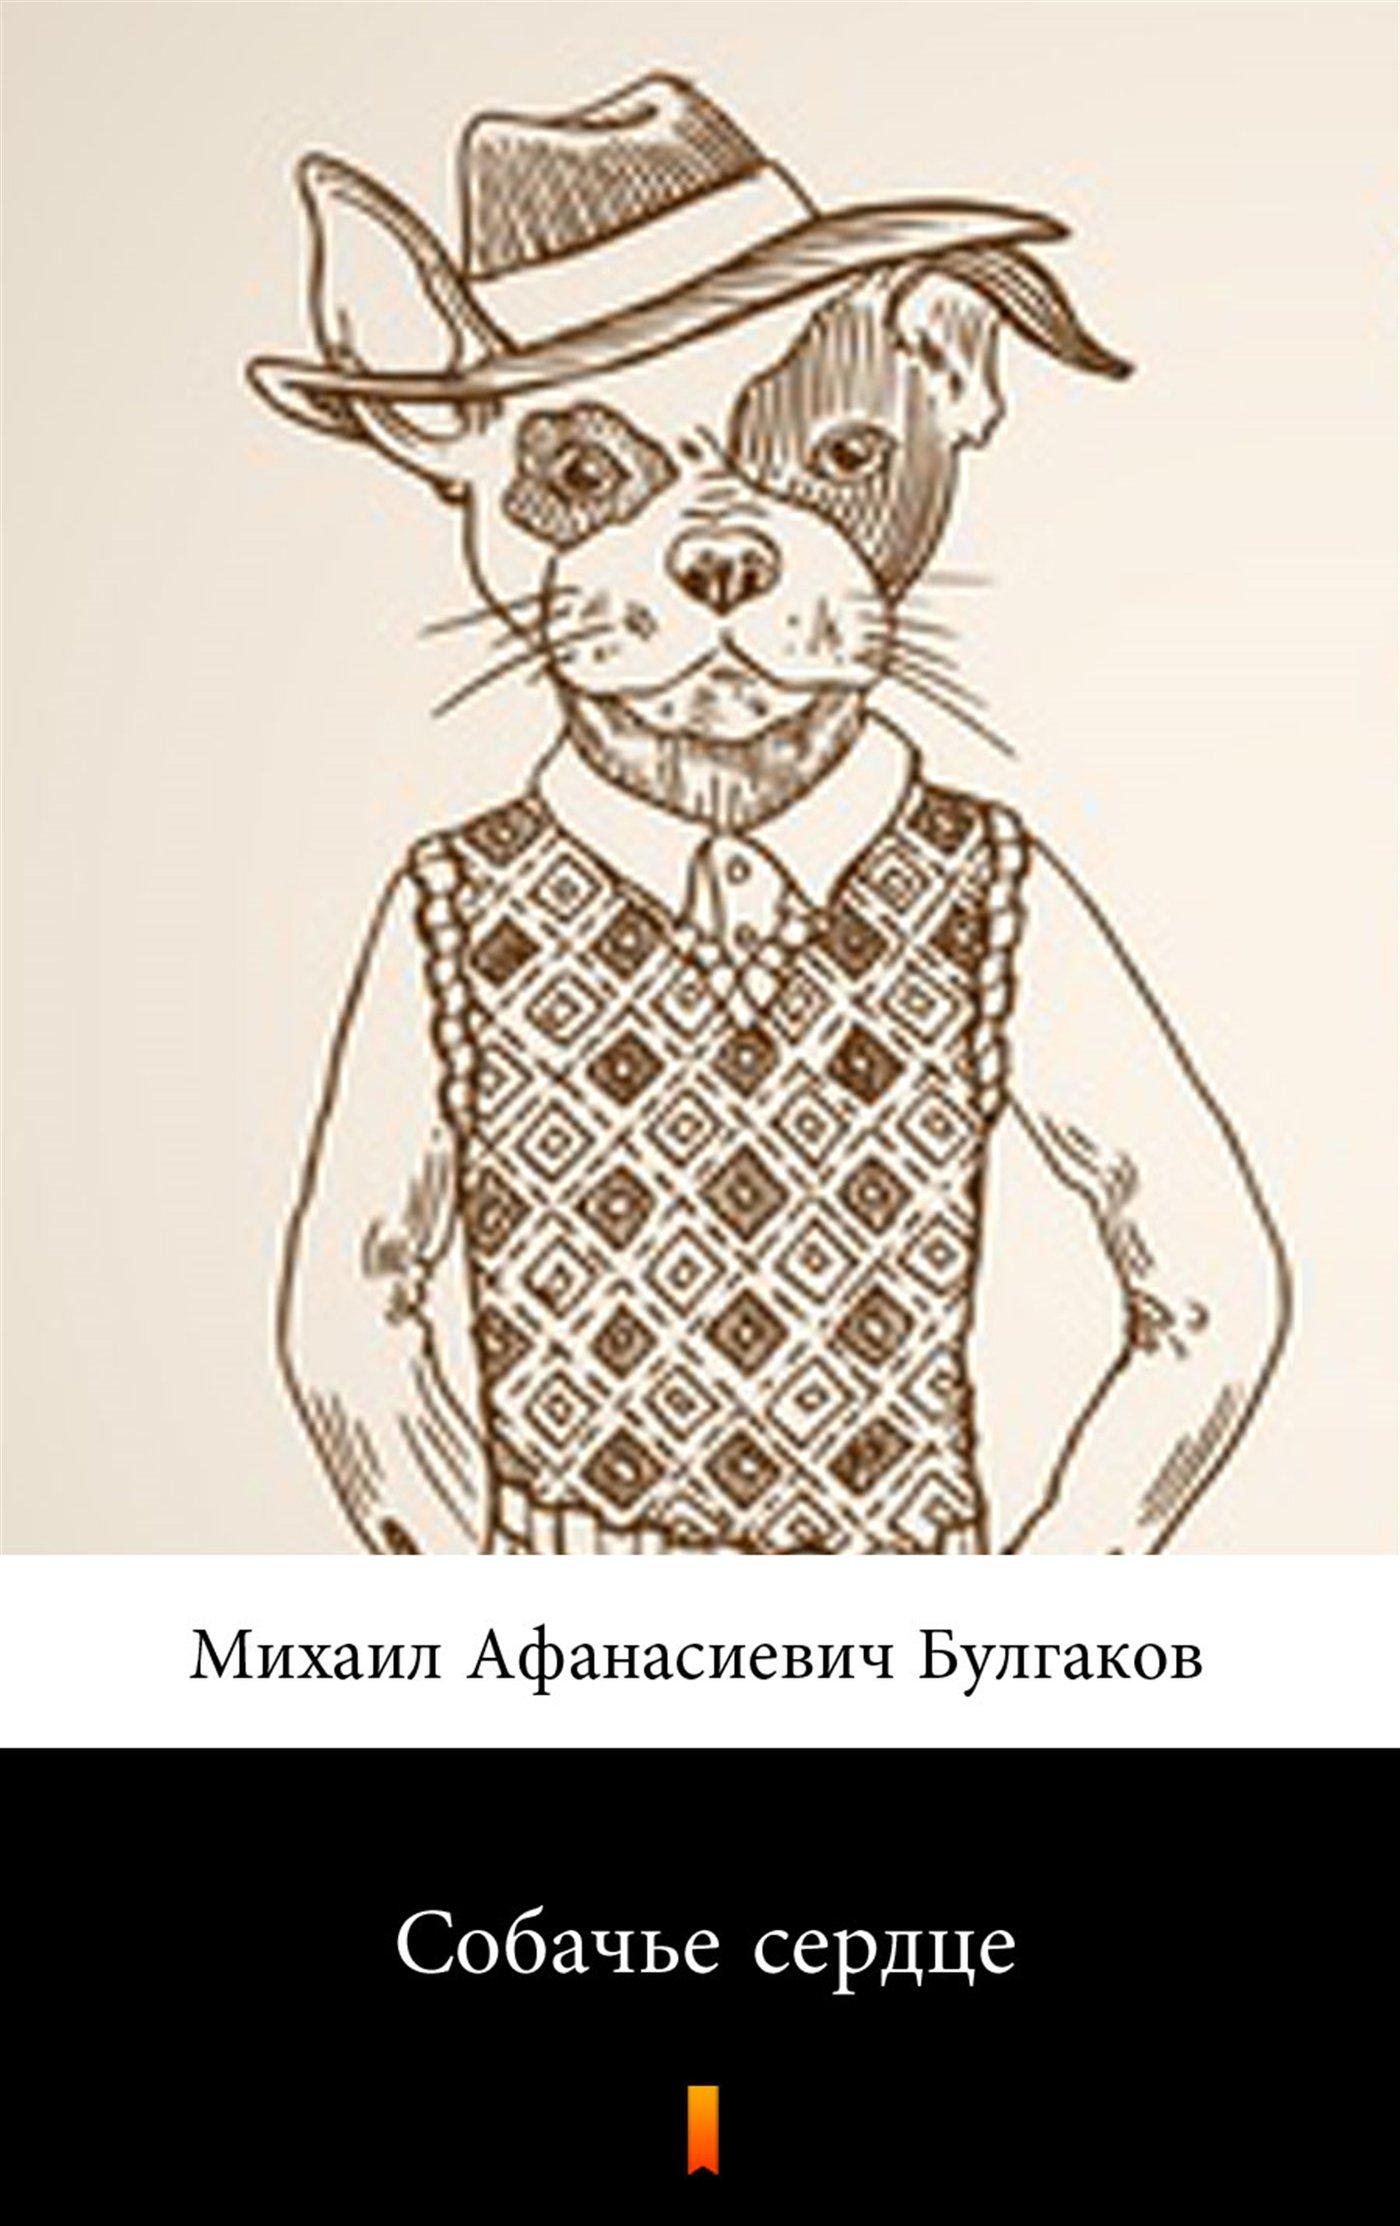 Собачье сердце - Ebook (Książka na Kindle) do pobrania w formacie MOBI